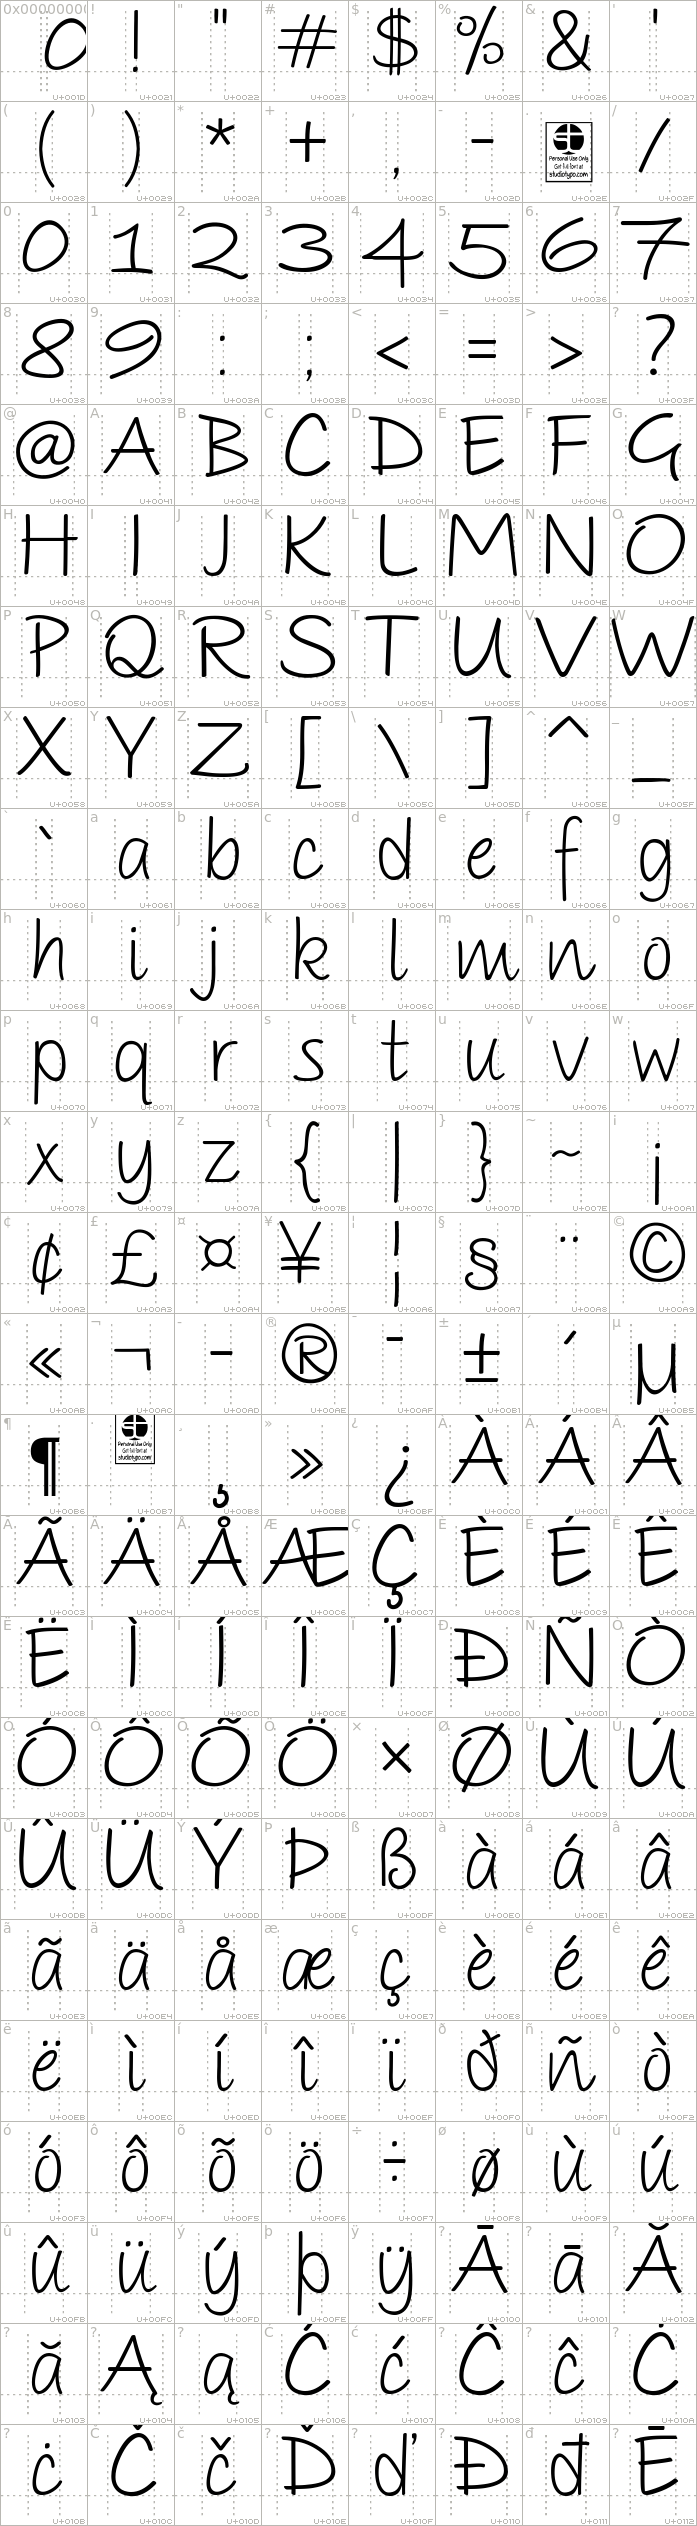 parole-script.demo.character-map-1